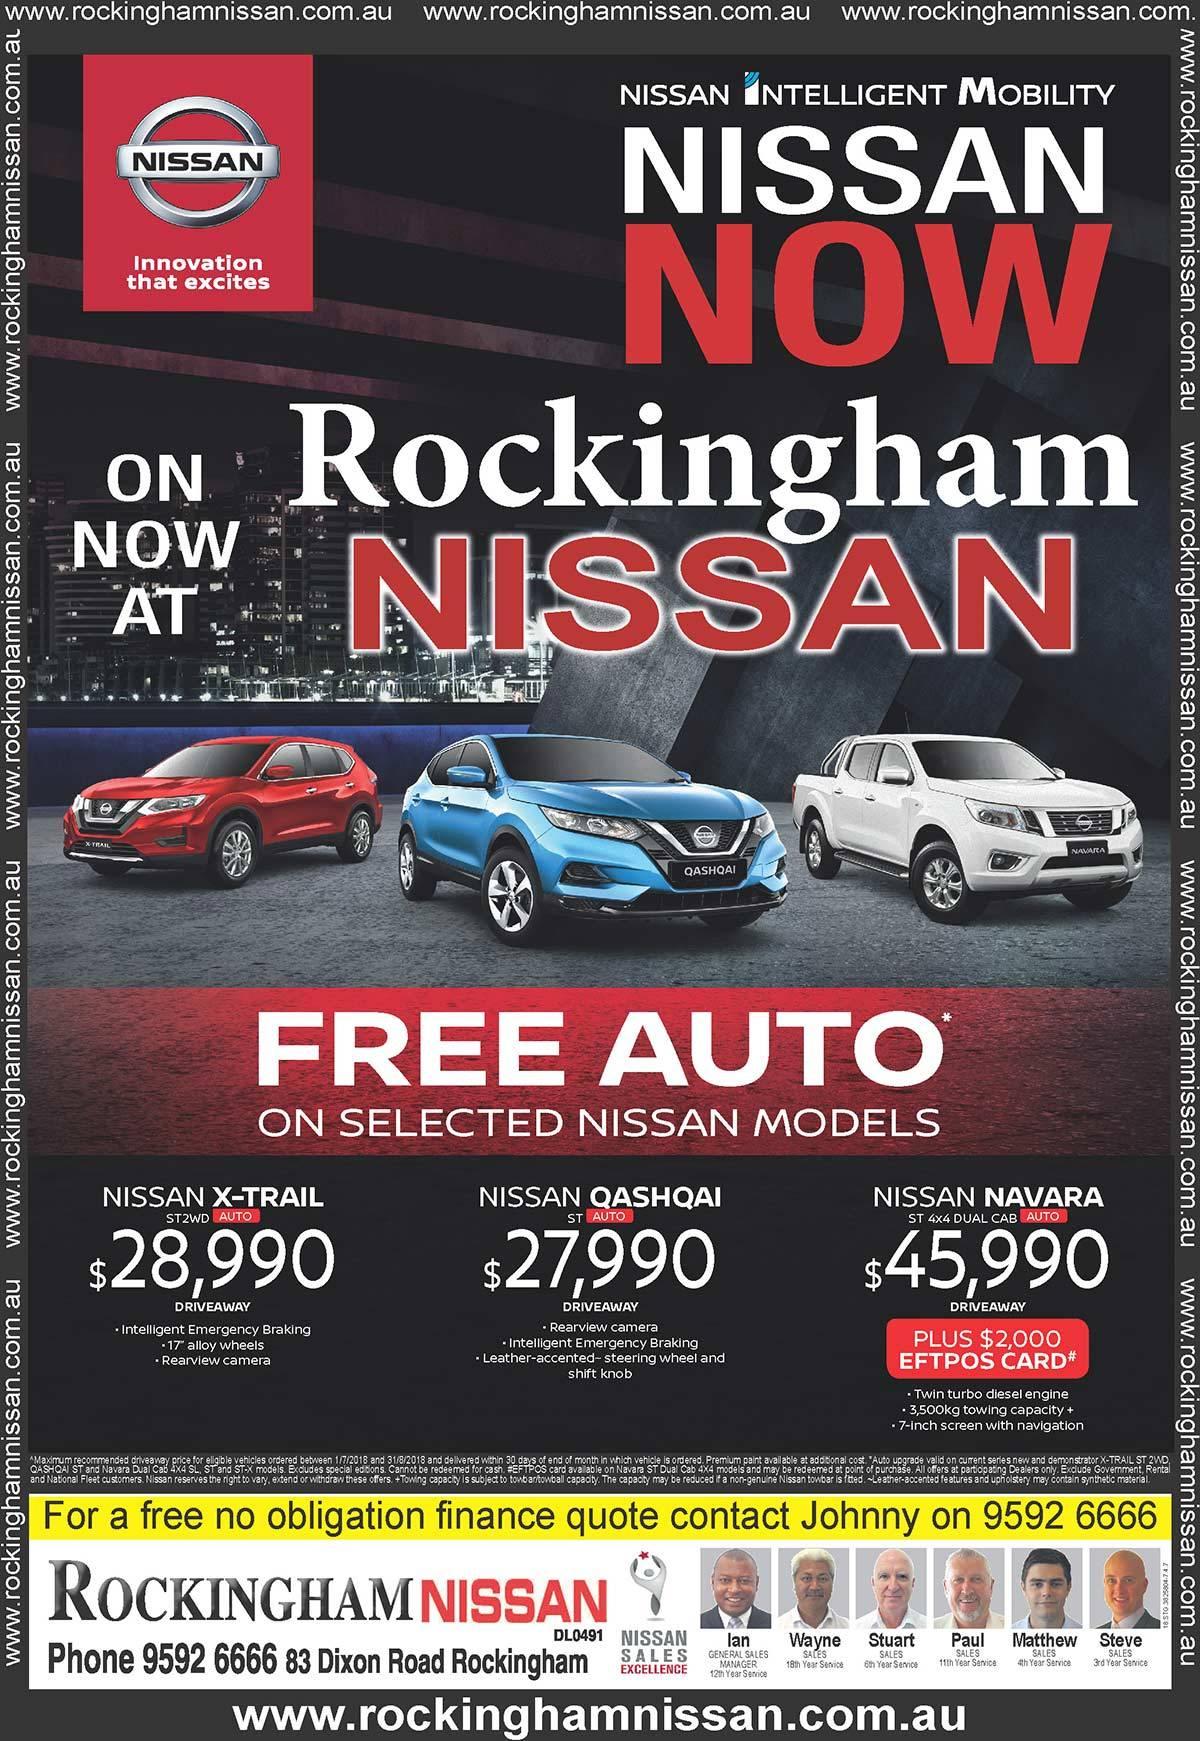 Rockingham Nissan Free Auto